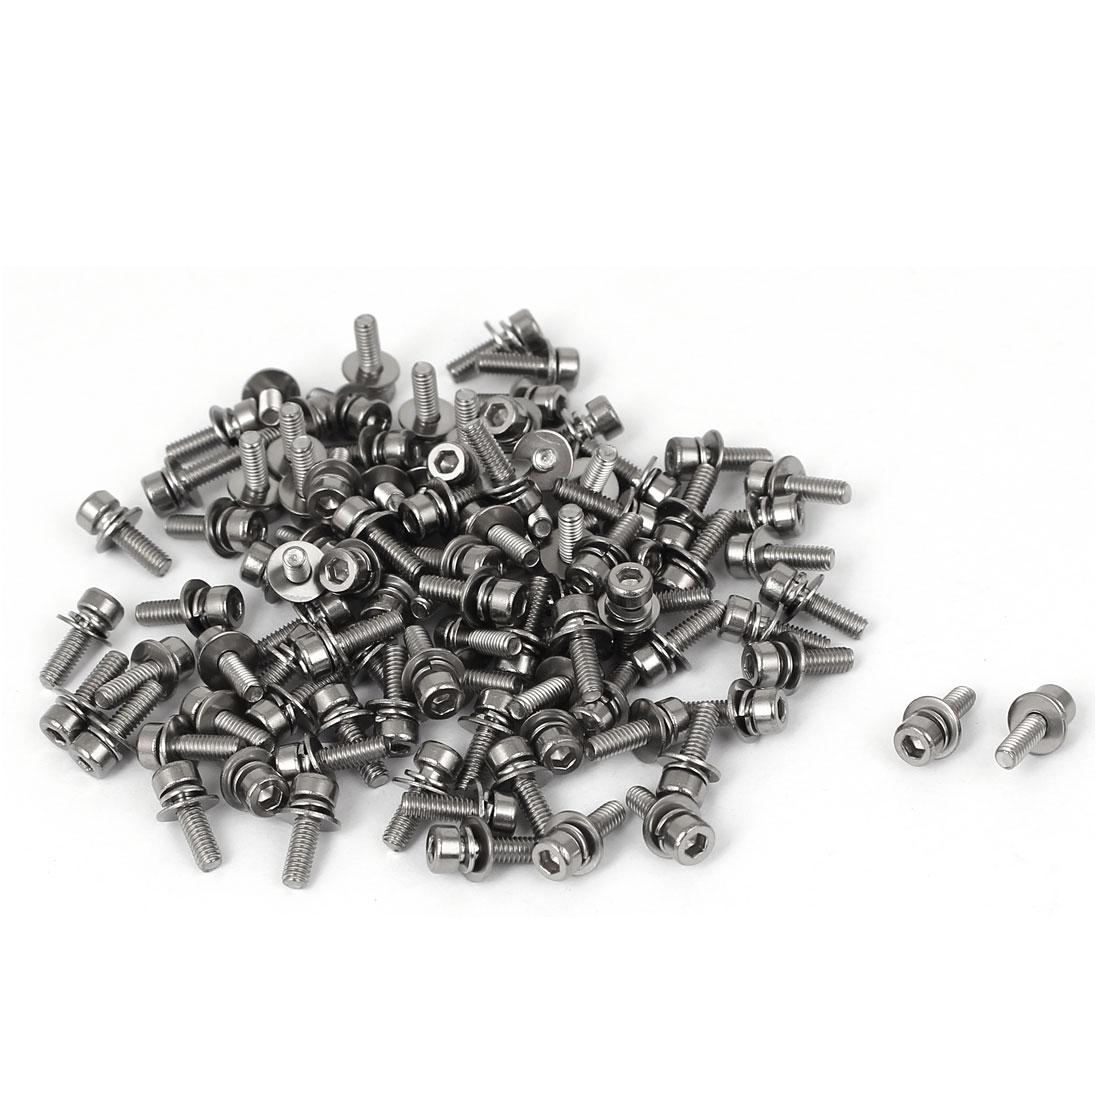 10mm Length M2.5 x 8mm Thread Hex Socket Head Cap Screw w Washer 100 Pcs